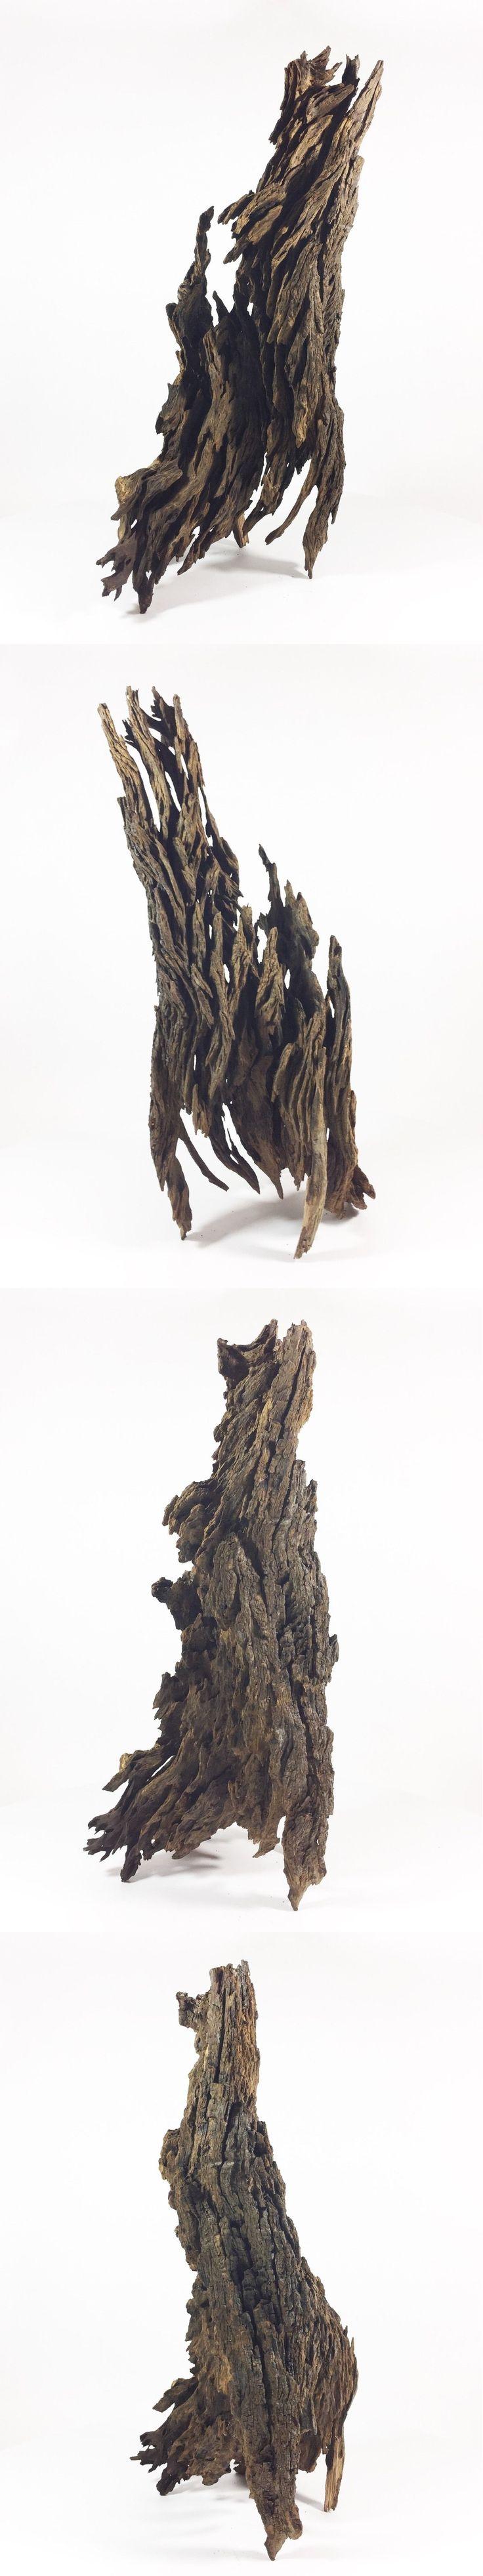 Animals Fish And Aquariums: 17Hx8l Driftwood Sculpture For Aquarium Aquascape Fish Tank BUY IT NOW ONLY: $41.96